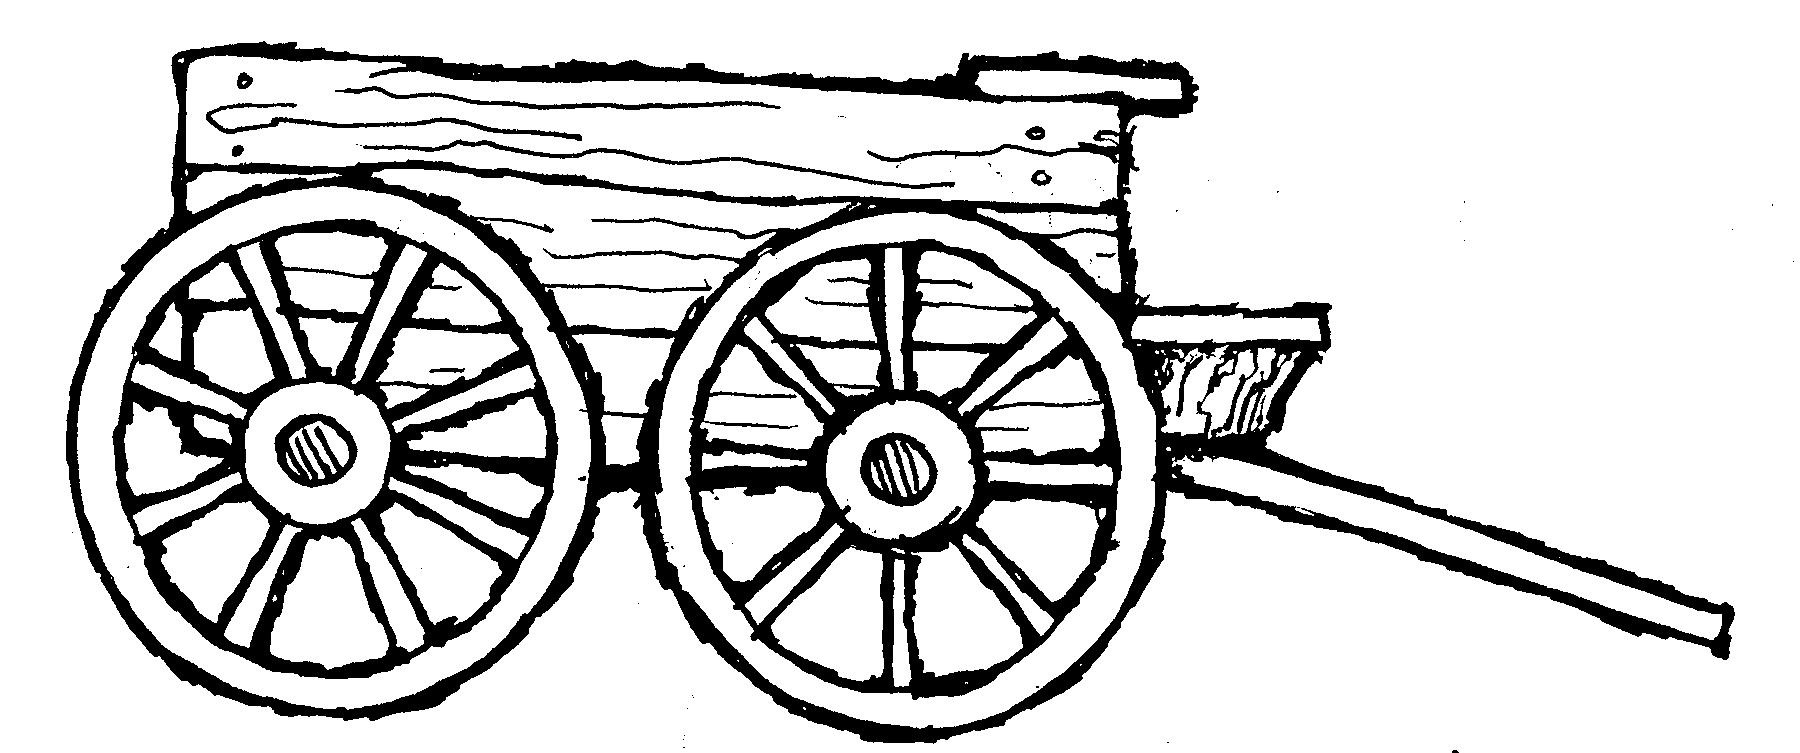 Cart clipart wooden cart Farm Wagon Clipart Wagon cliparts